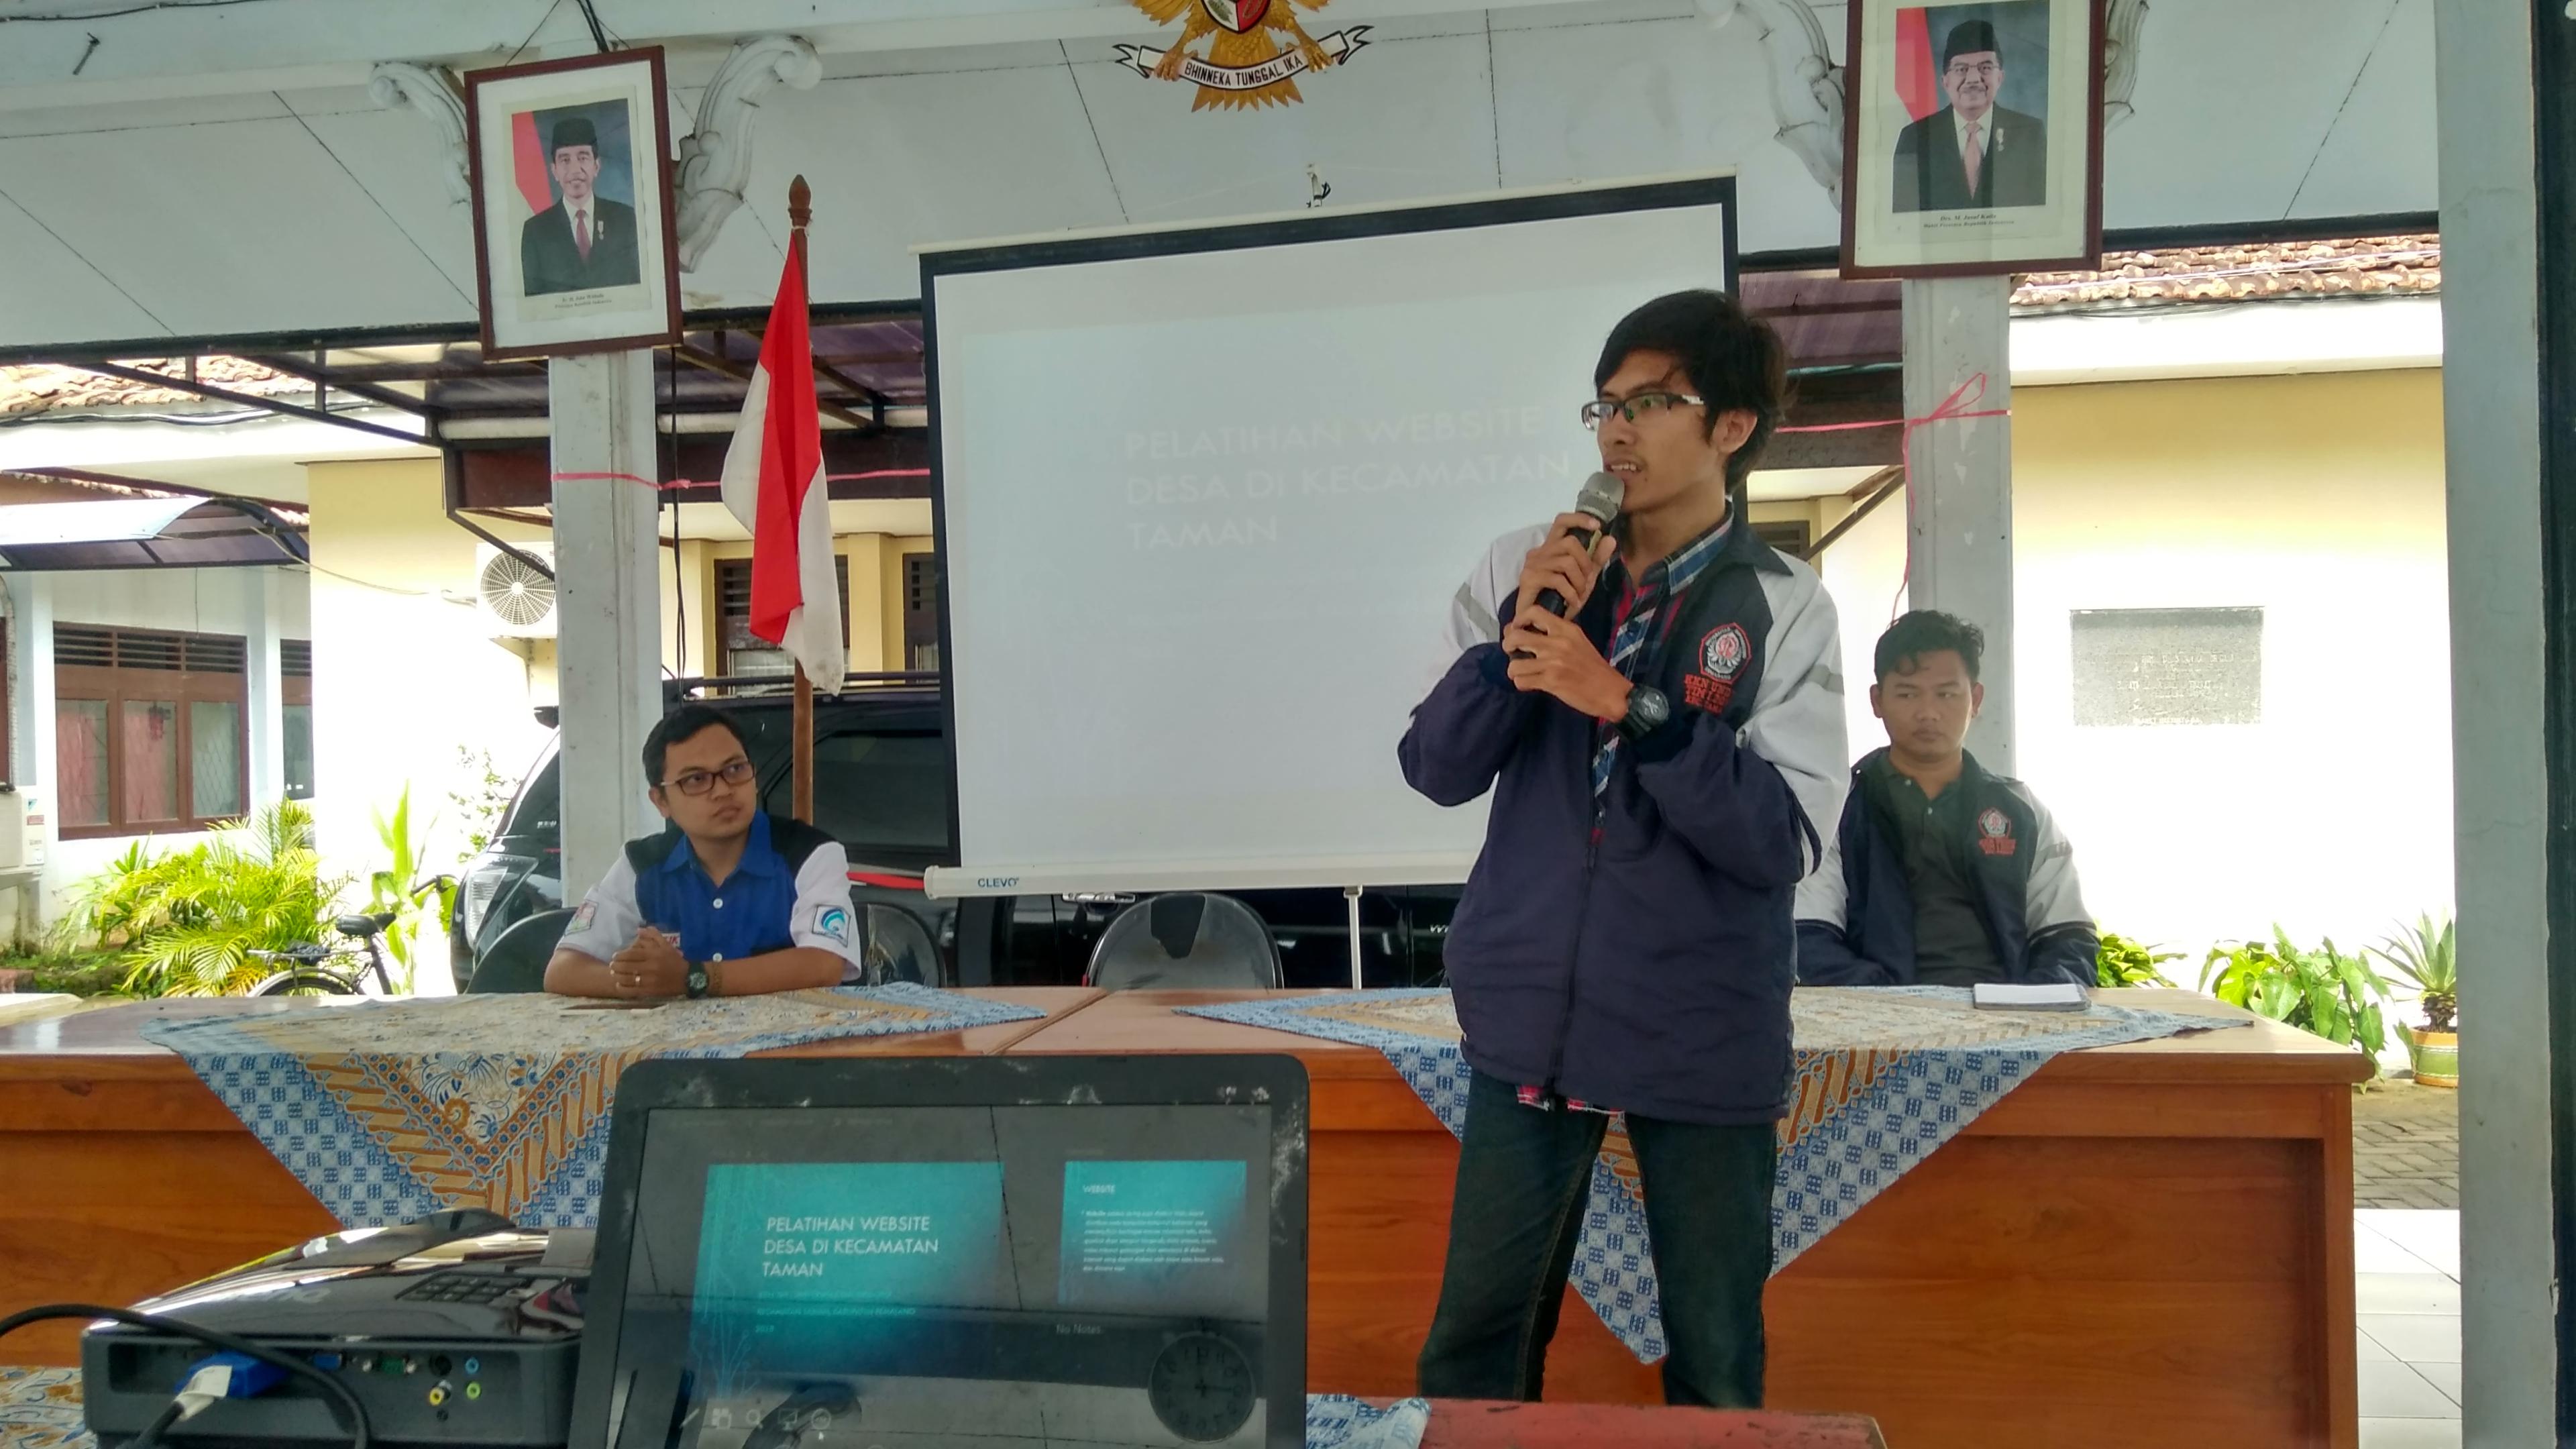 Zaenal Muttaqin (Duduk, sebelah kiri) & Harlian Tri Mardian (Berdiri) memberikan sambutan pada awal acara. Dokumentasi Tim Puspindes.